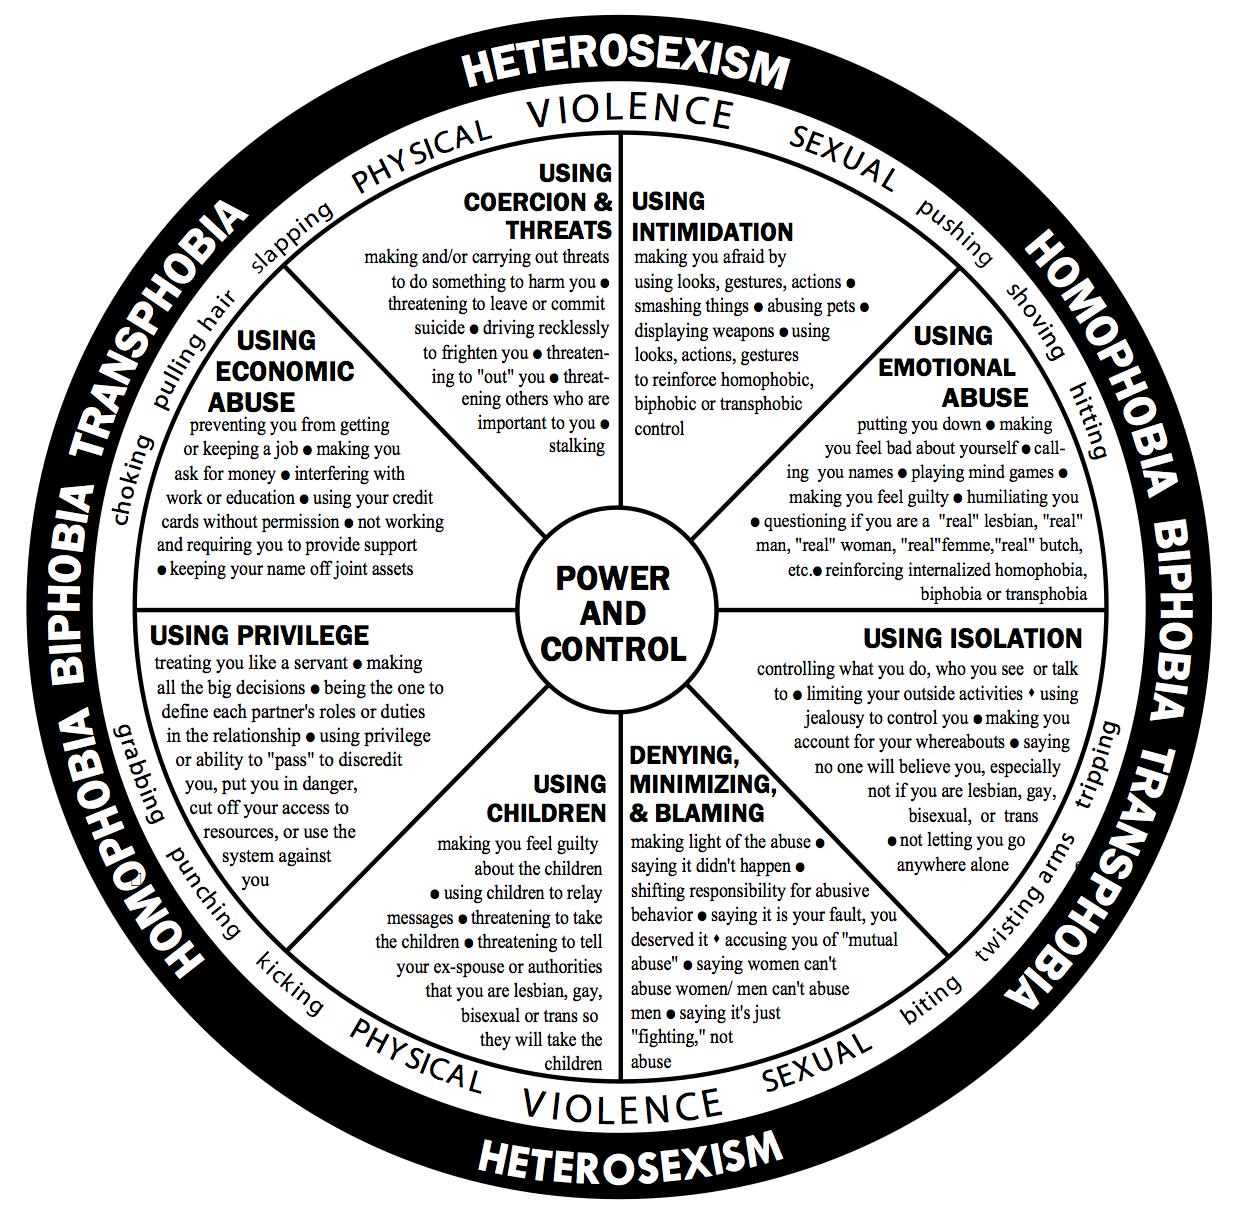 Intimate Partner Violence/Domestic Violence in LGBT Relationships